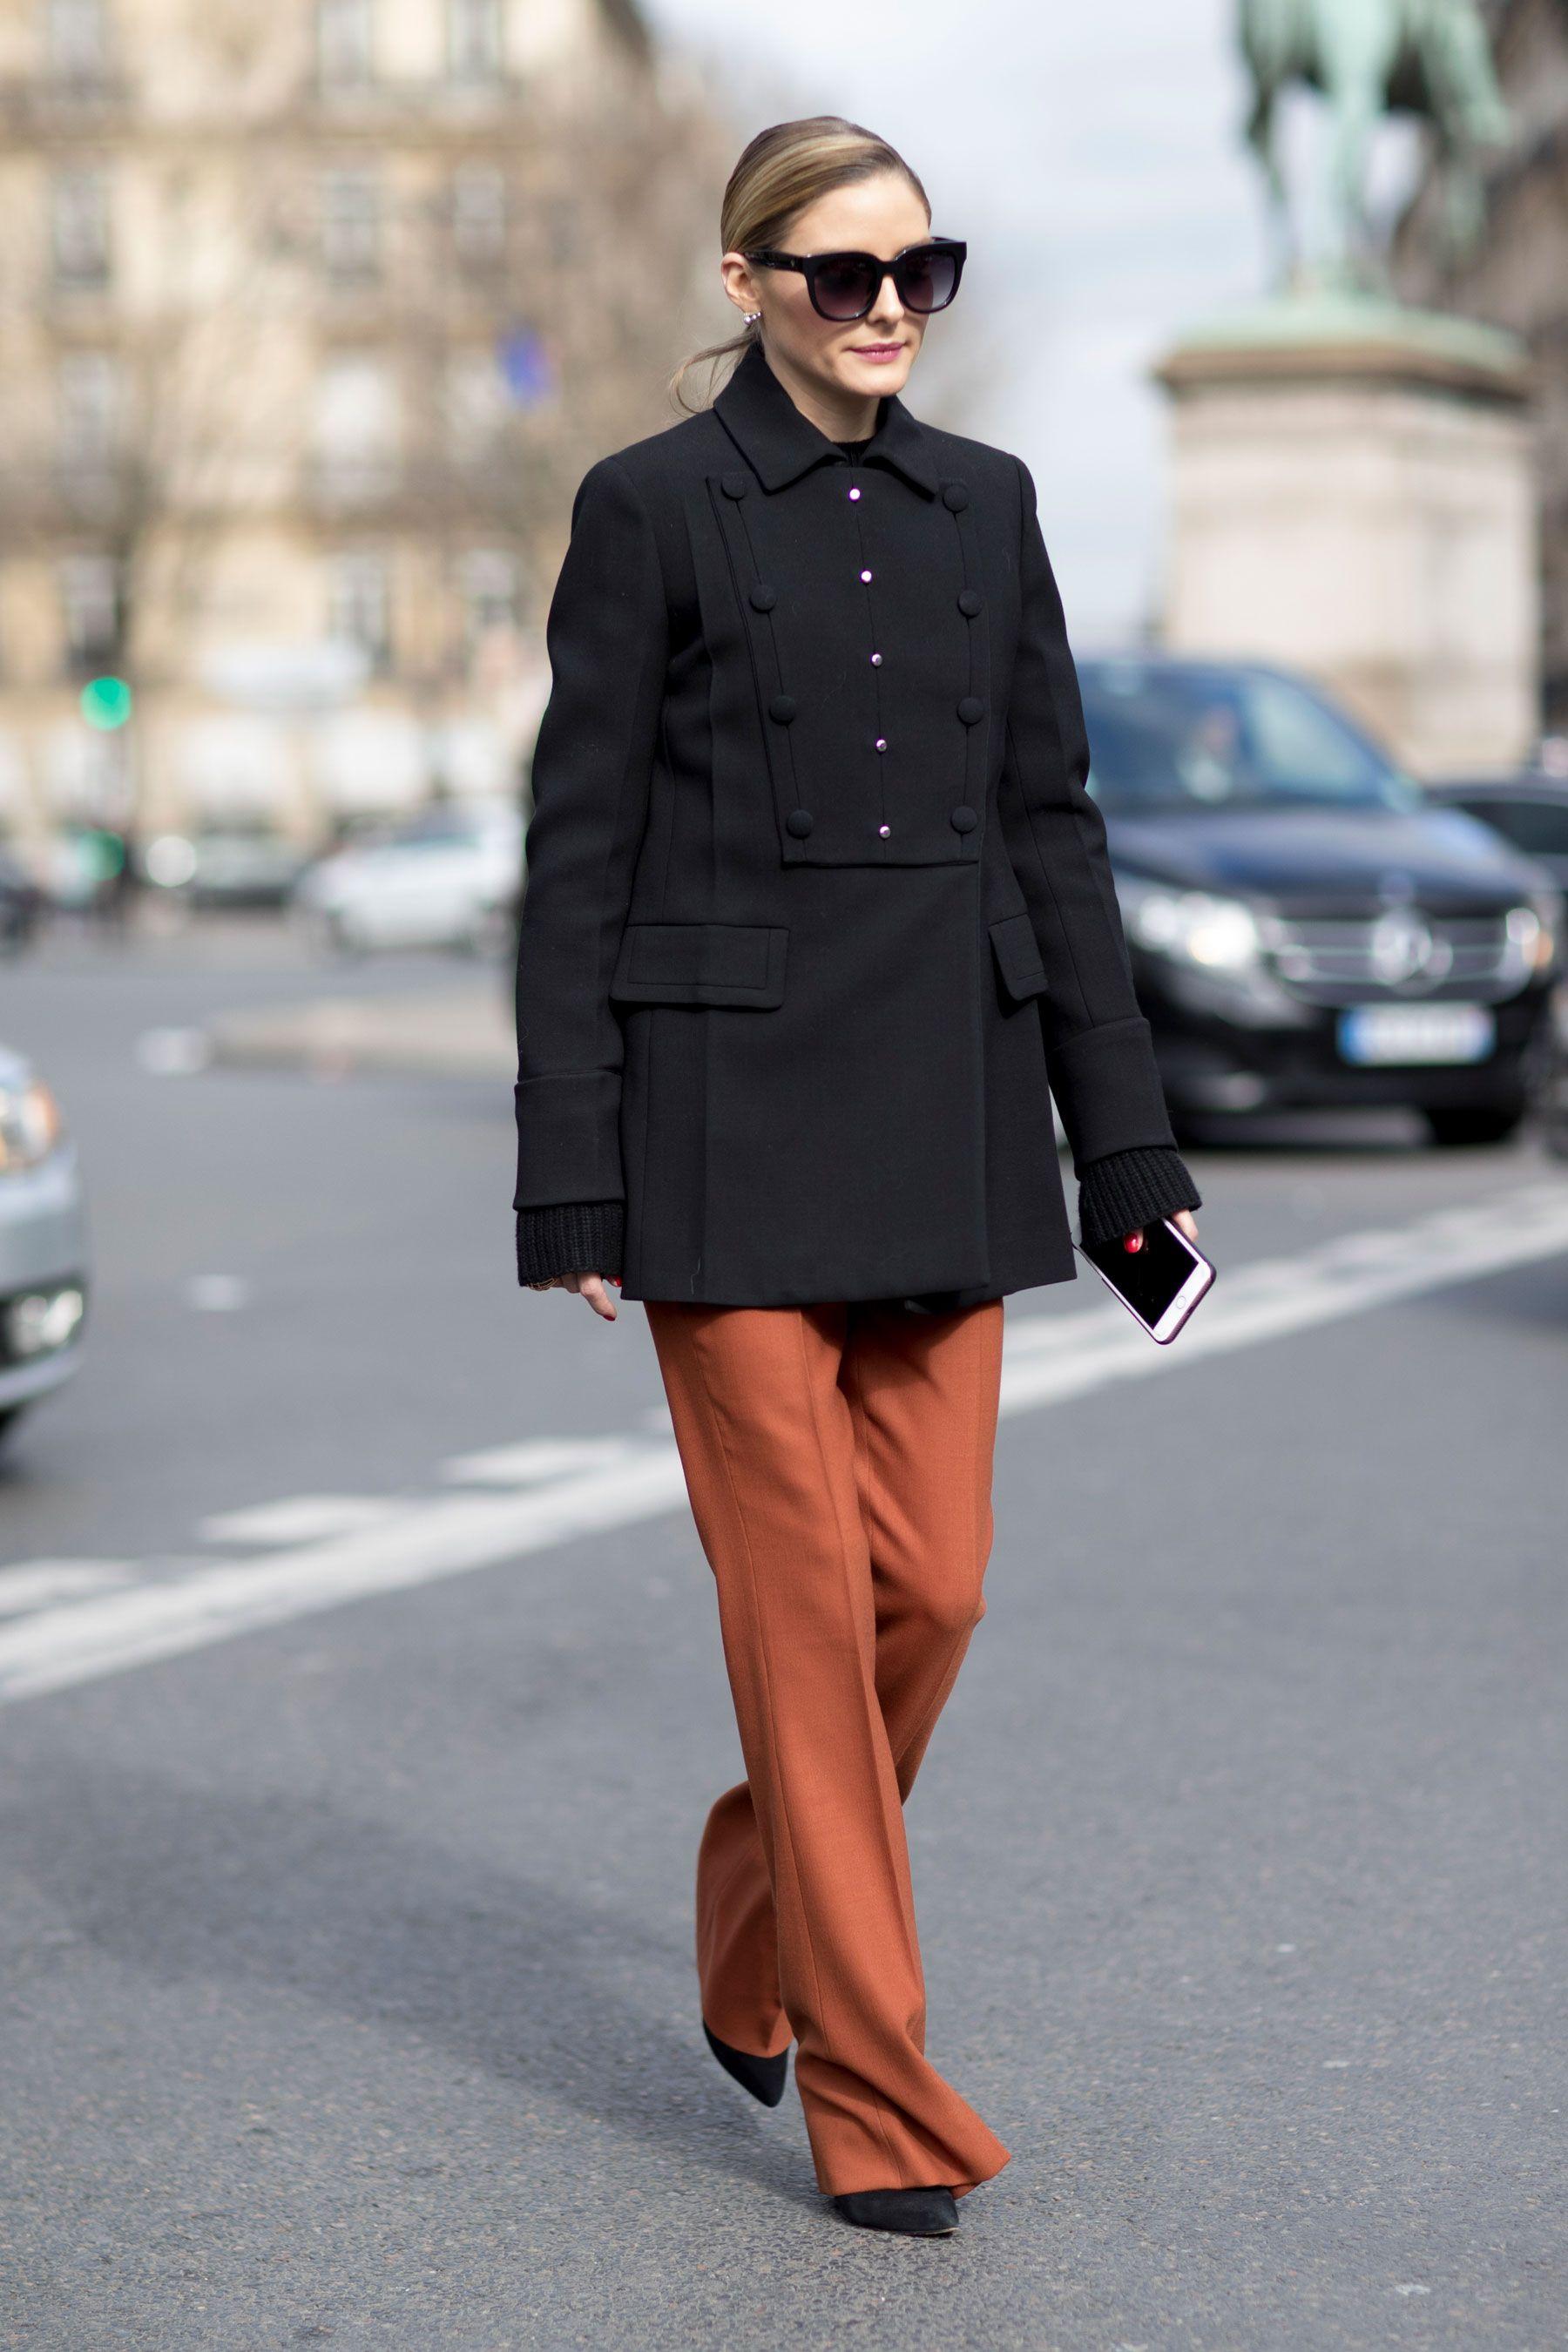 c568800986ef The Best Street Style At Paris Fashion Week Autumn Winter 2017 in ...